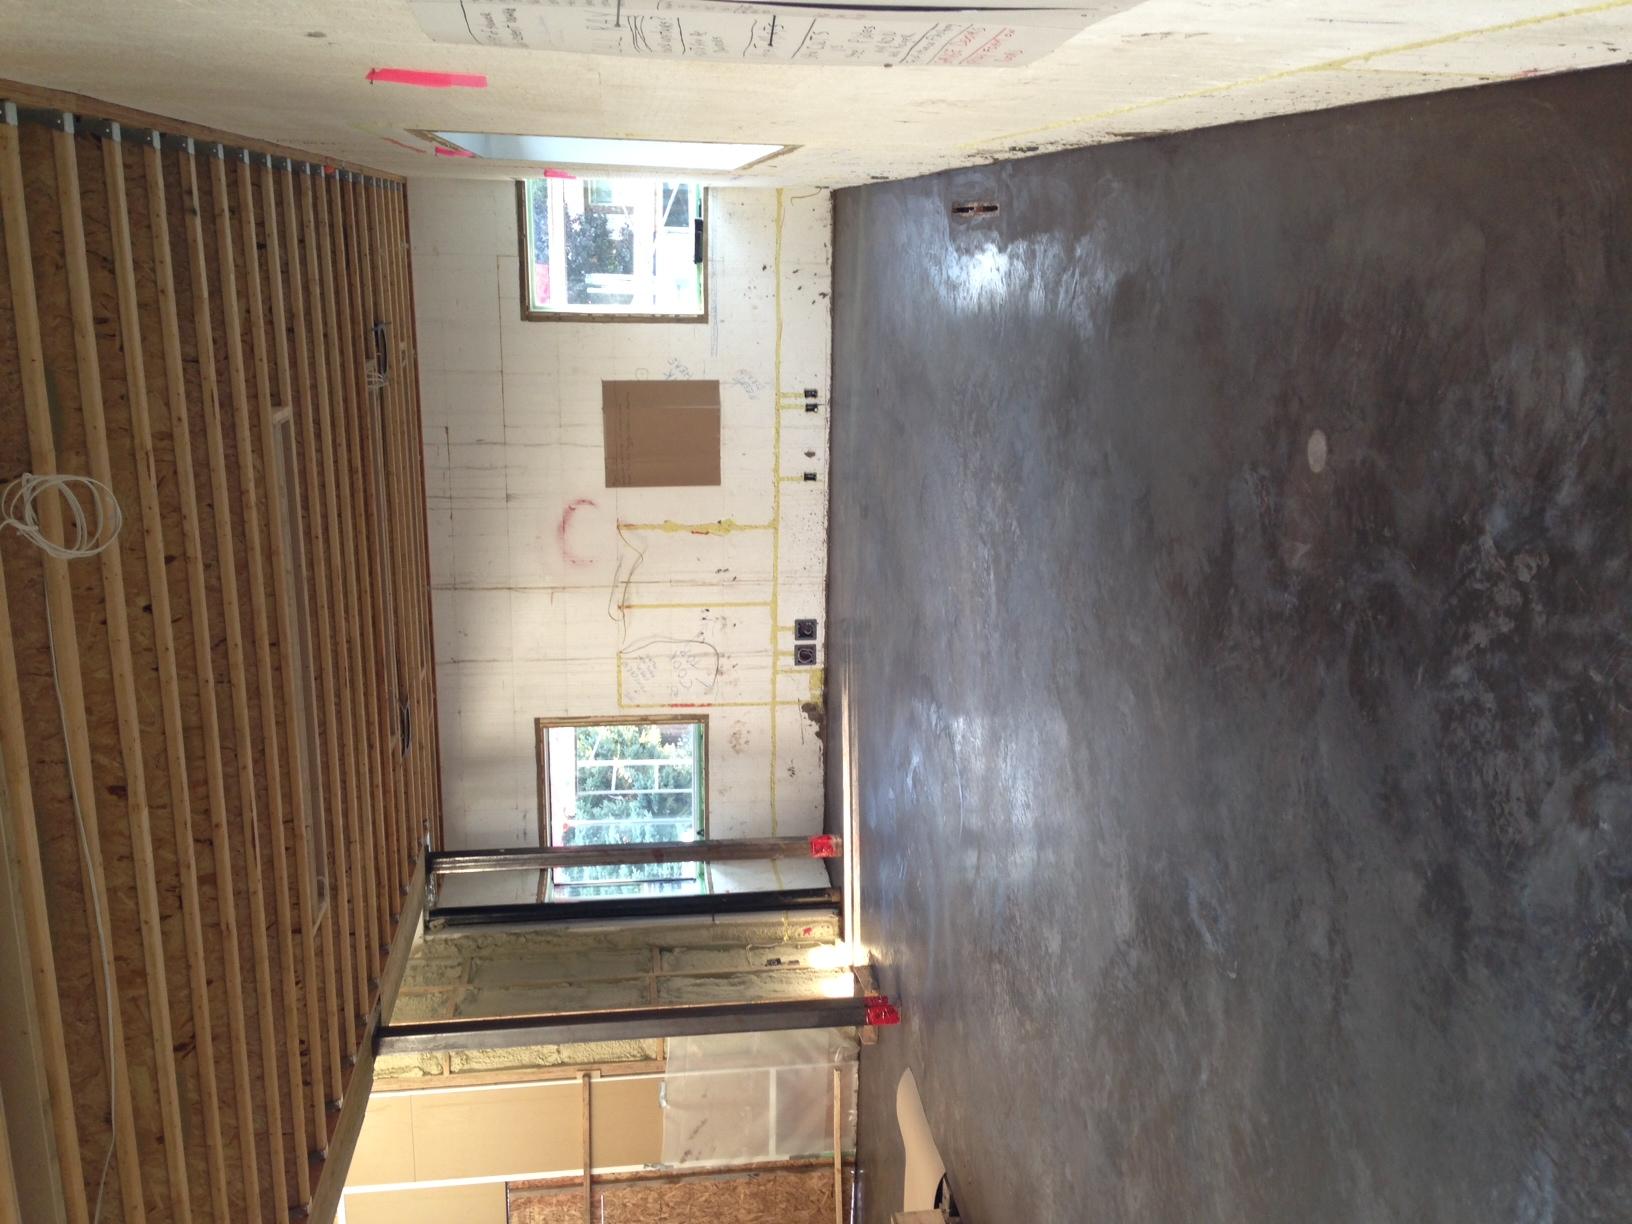 innes_construction1.JPG